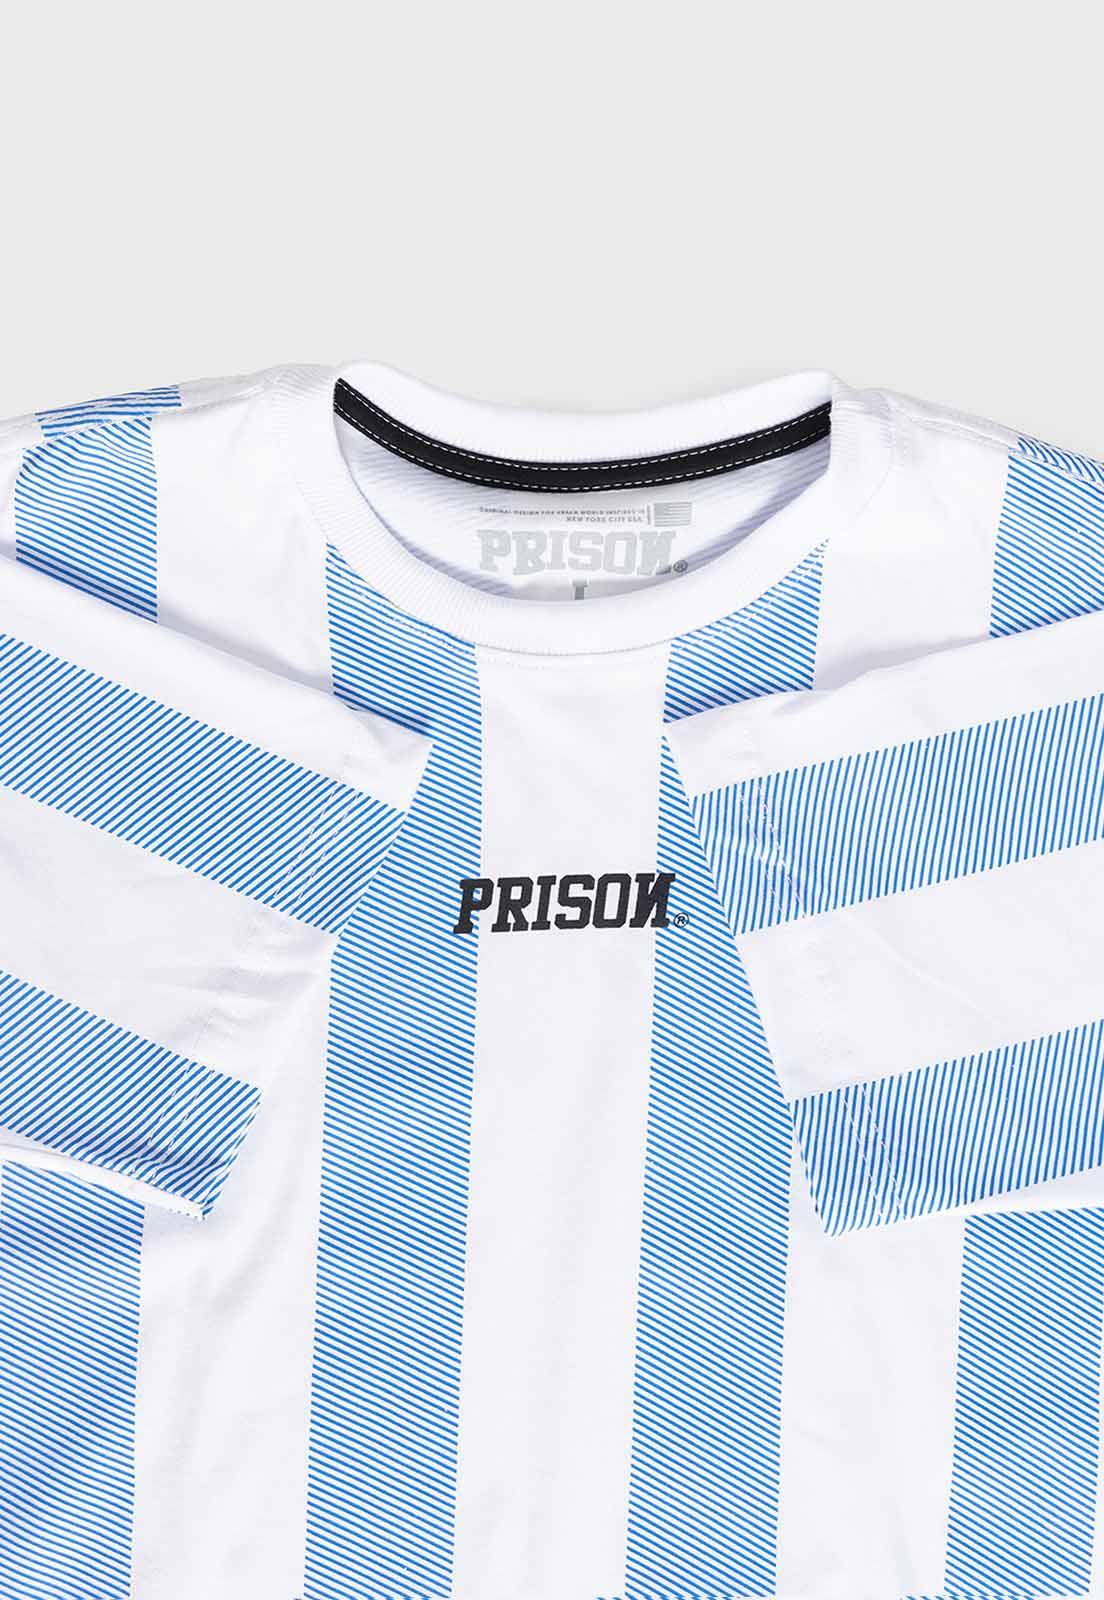 Camiseta Prison Listrada Long Blue